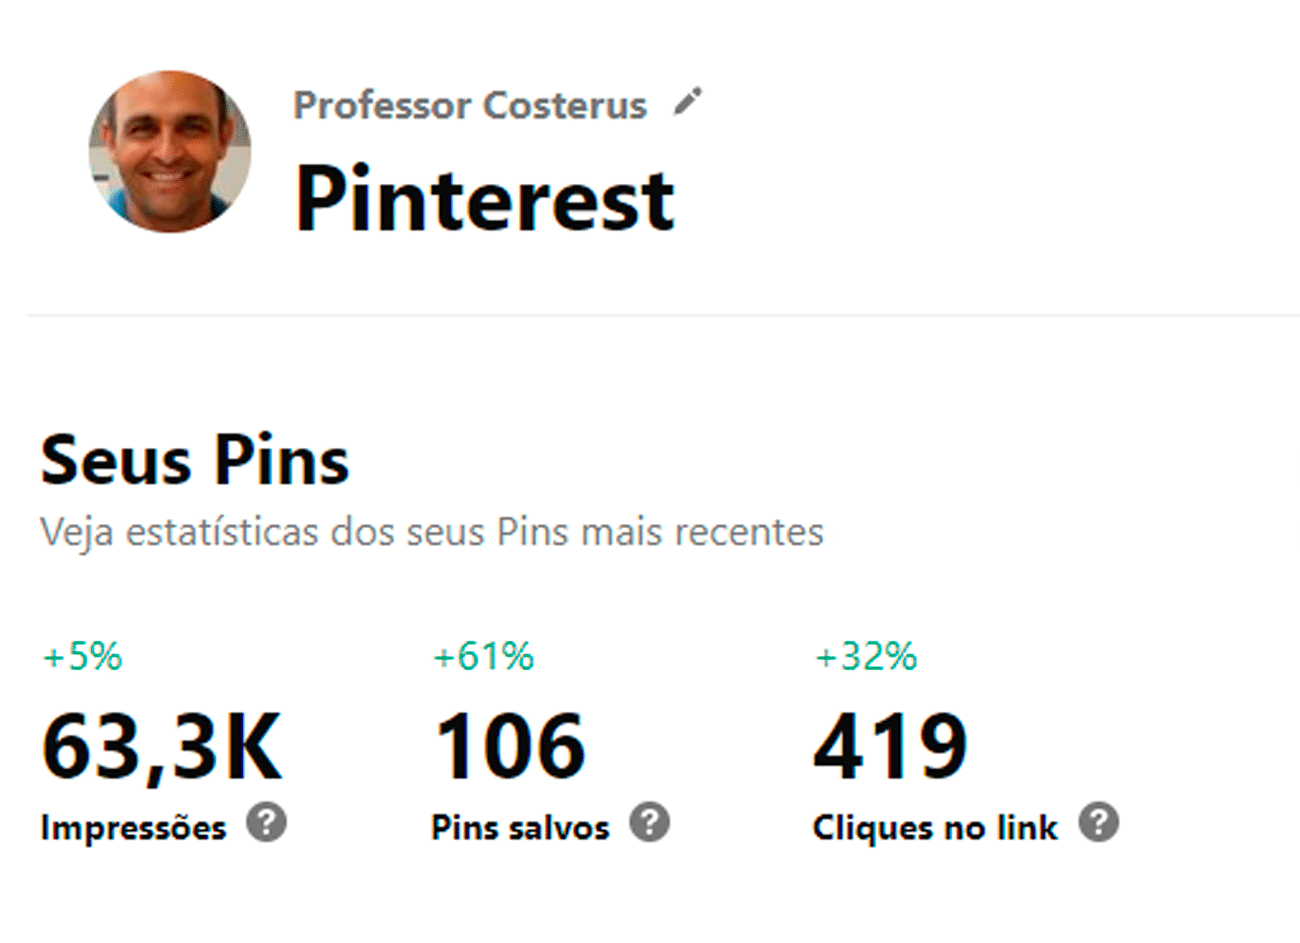 pinterest-professor-costerus